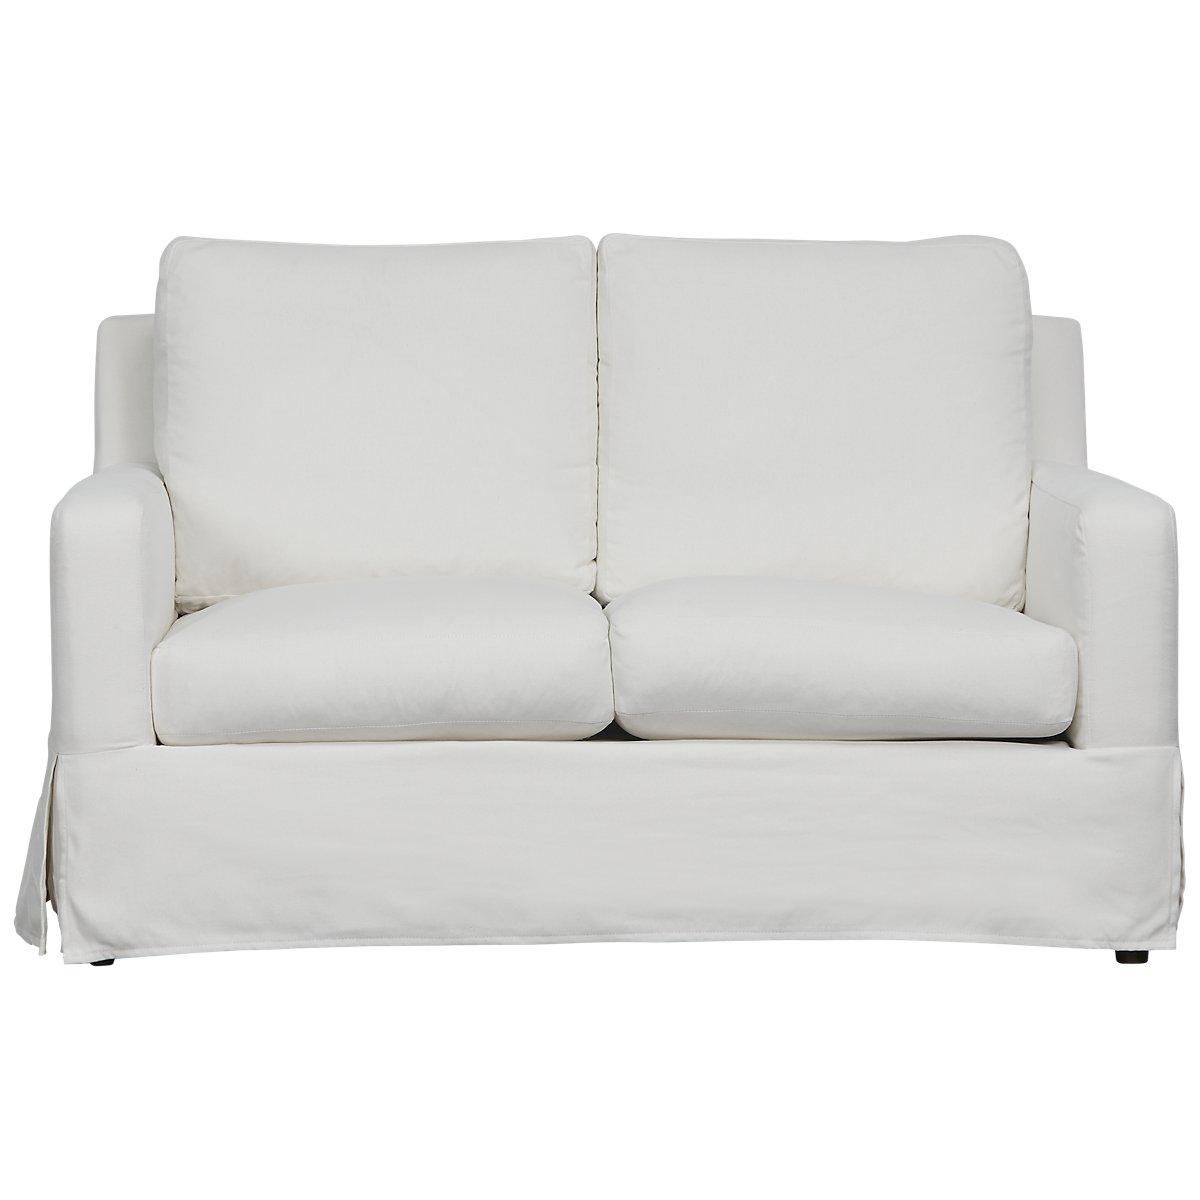 City Furniture Bree White Fabric Loveseat